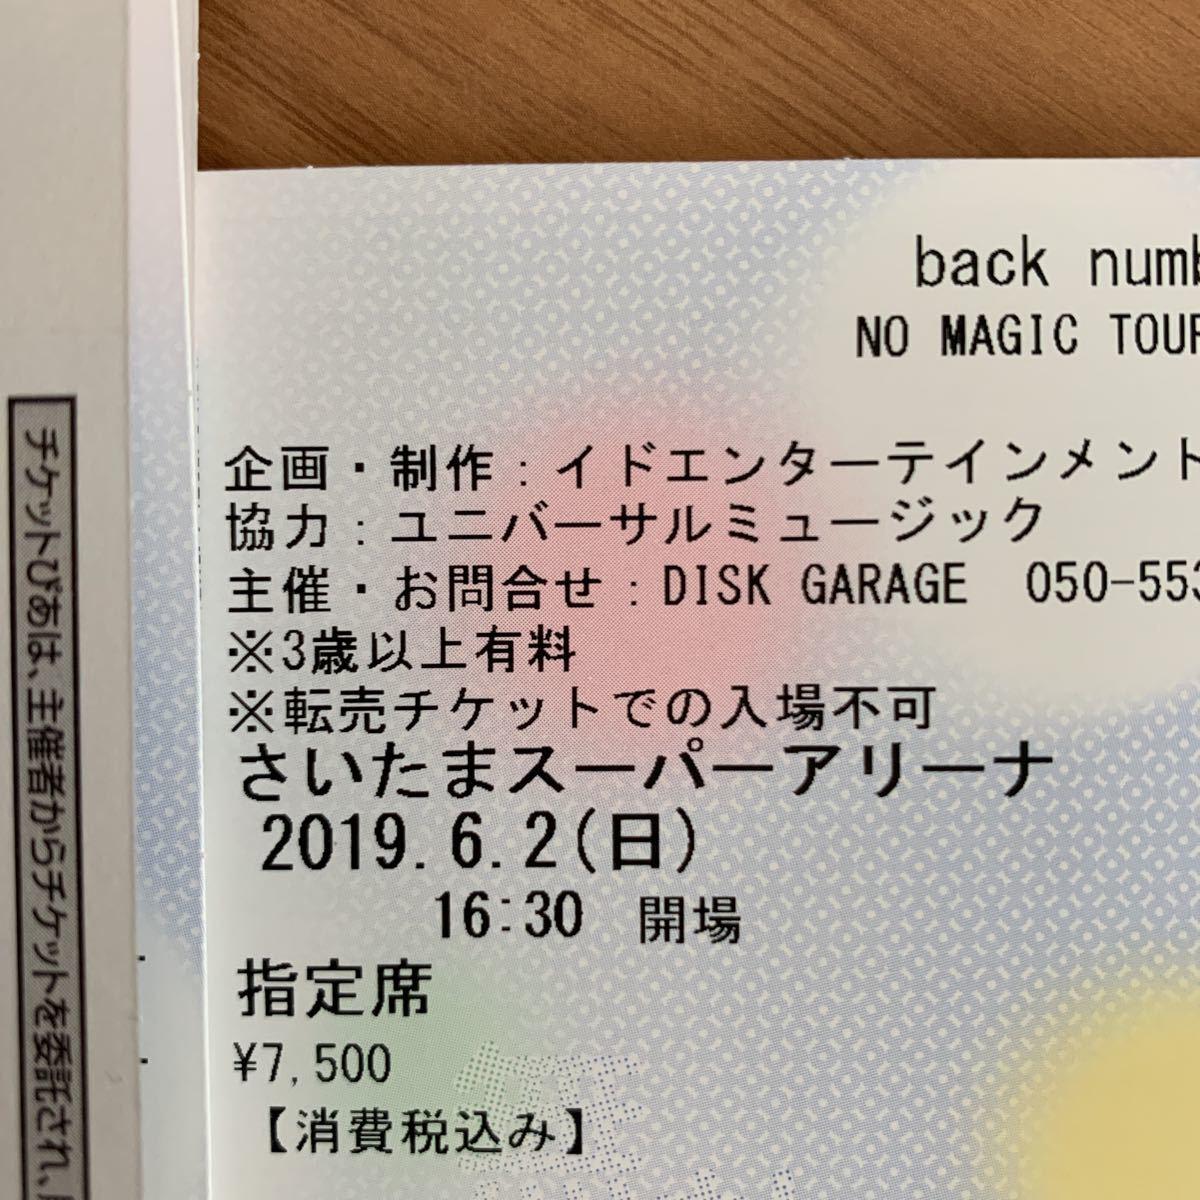 back number ☆ 6/2 さいたまスーパーアリーナ ☆ チケット